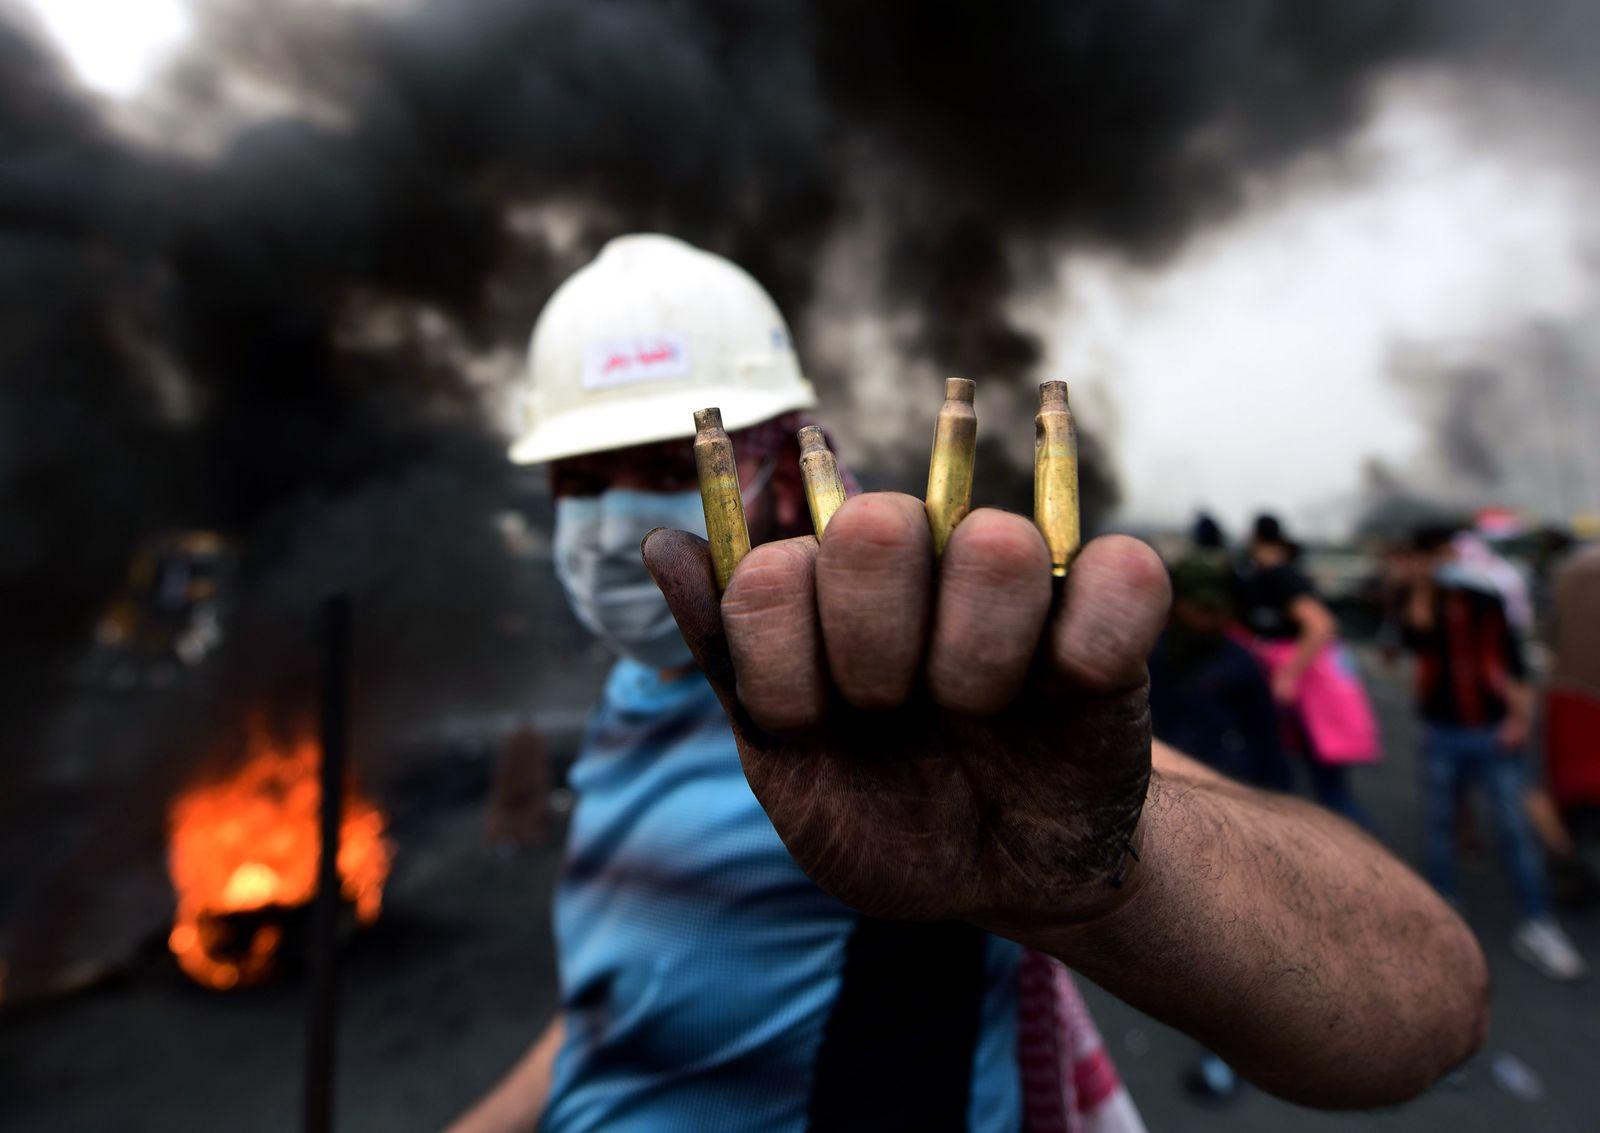 Protests in Baghdad, Iraq - 19 Jan 2020